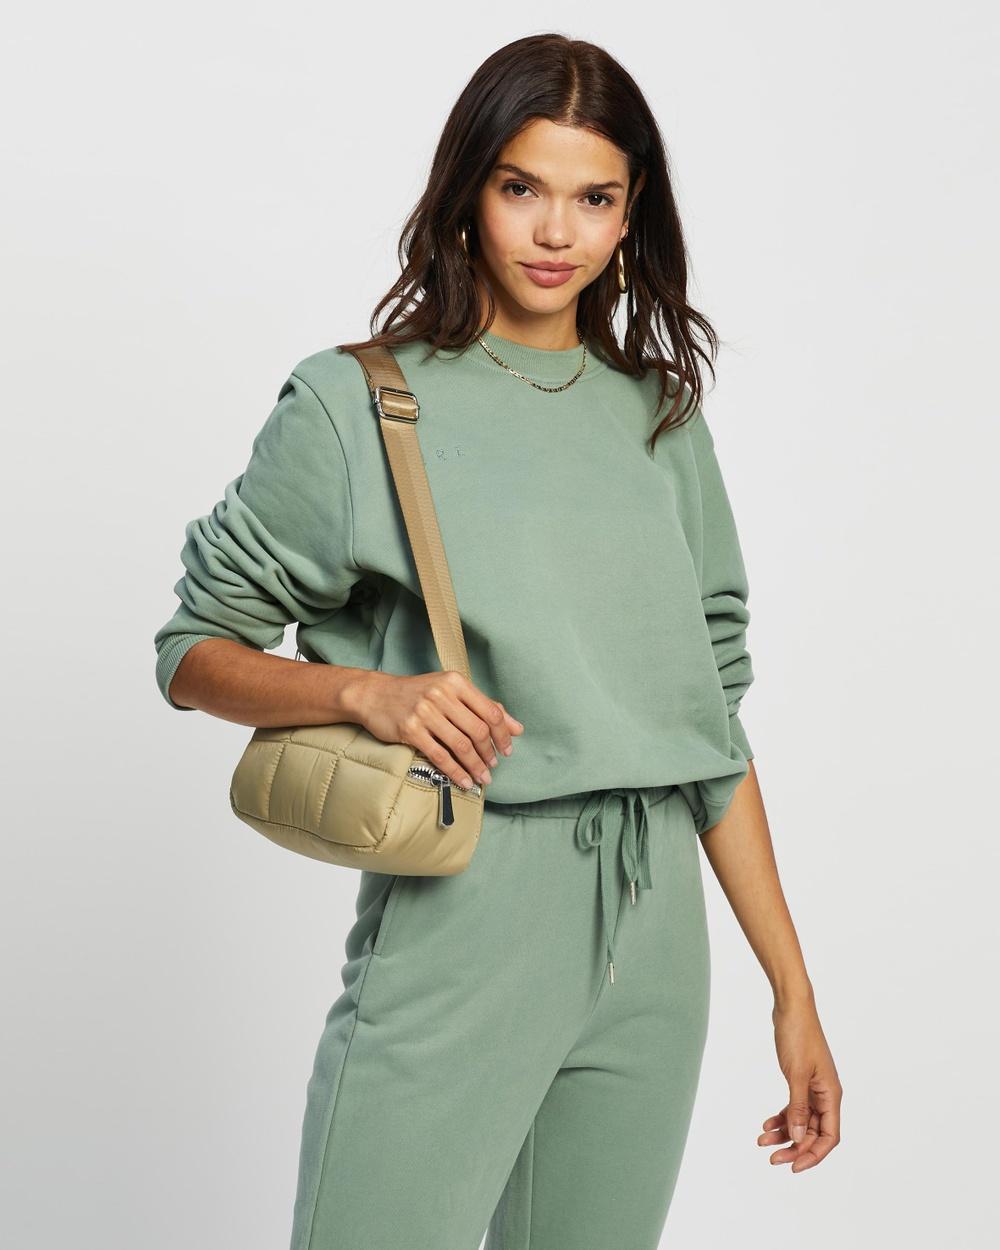 AERE Organic Cotton Sweat Top Sweats Grey Green